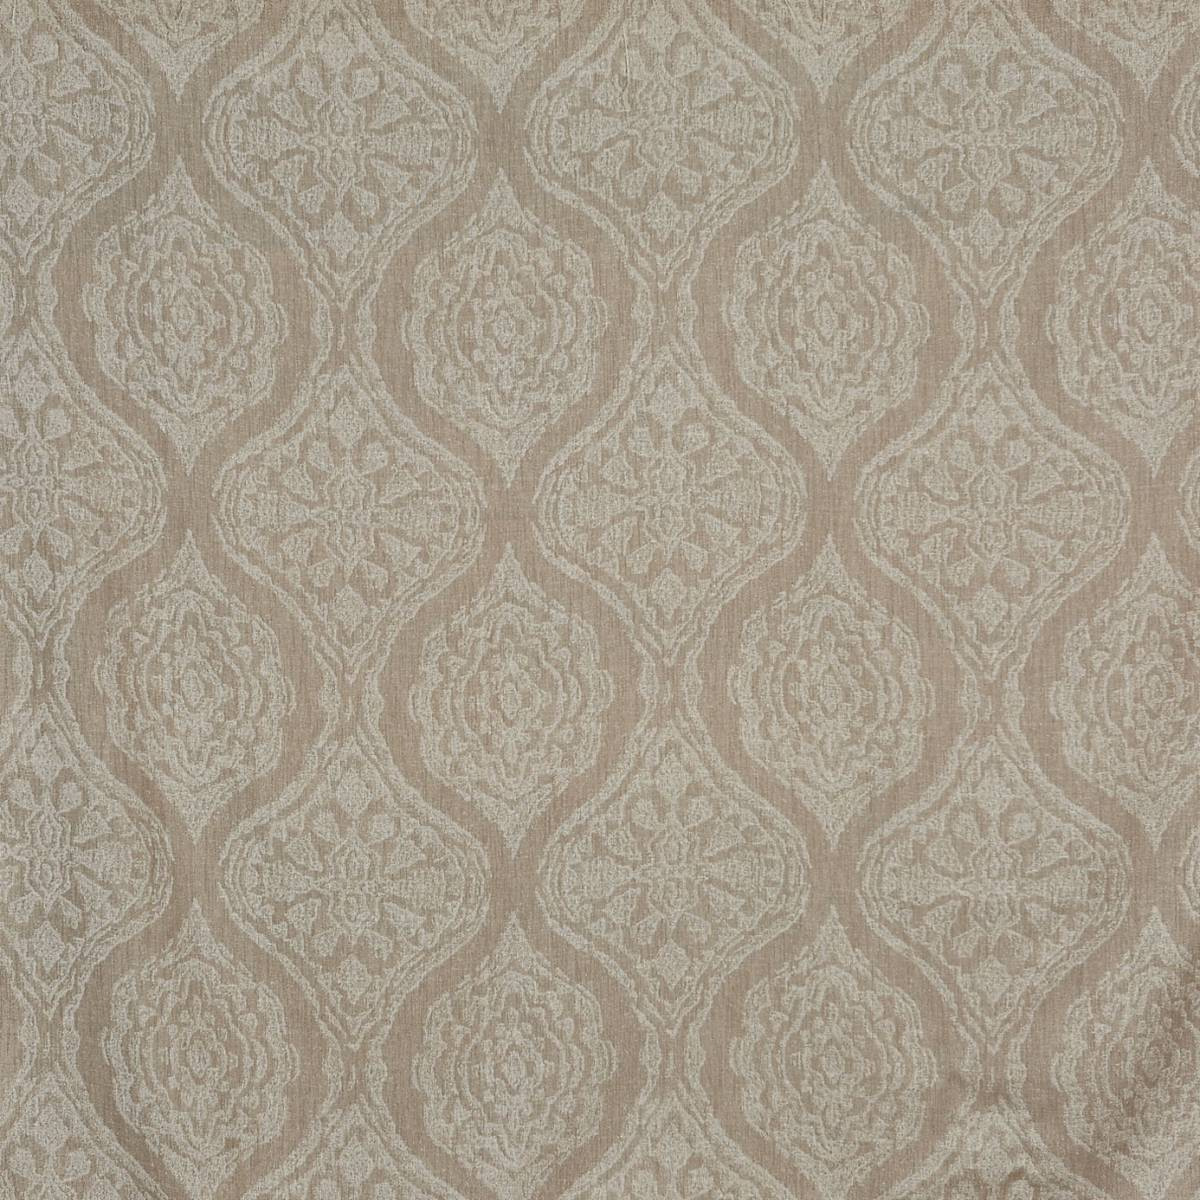 Beach Fabric Sand 7805 504 Prestigious Textiles